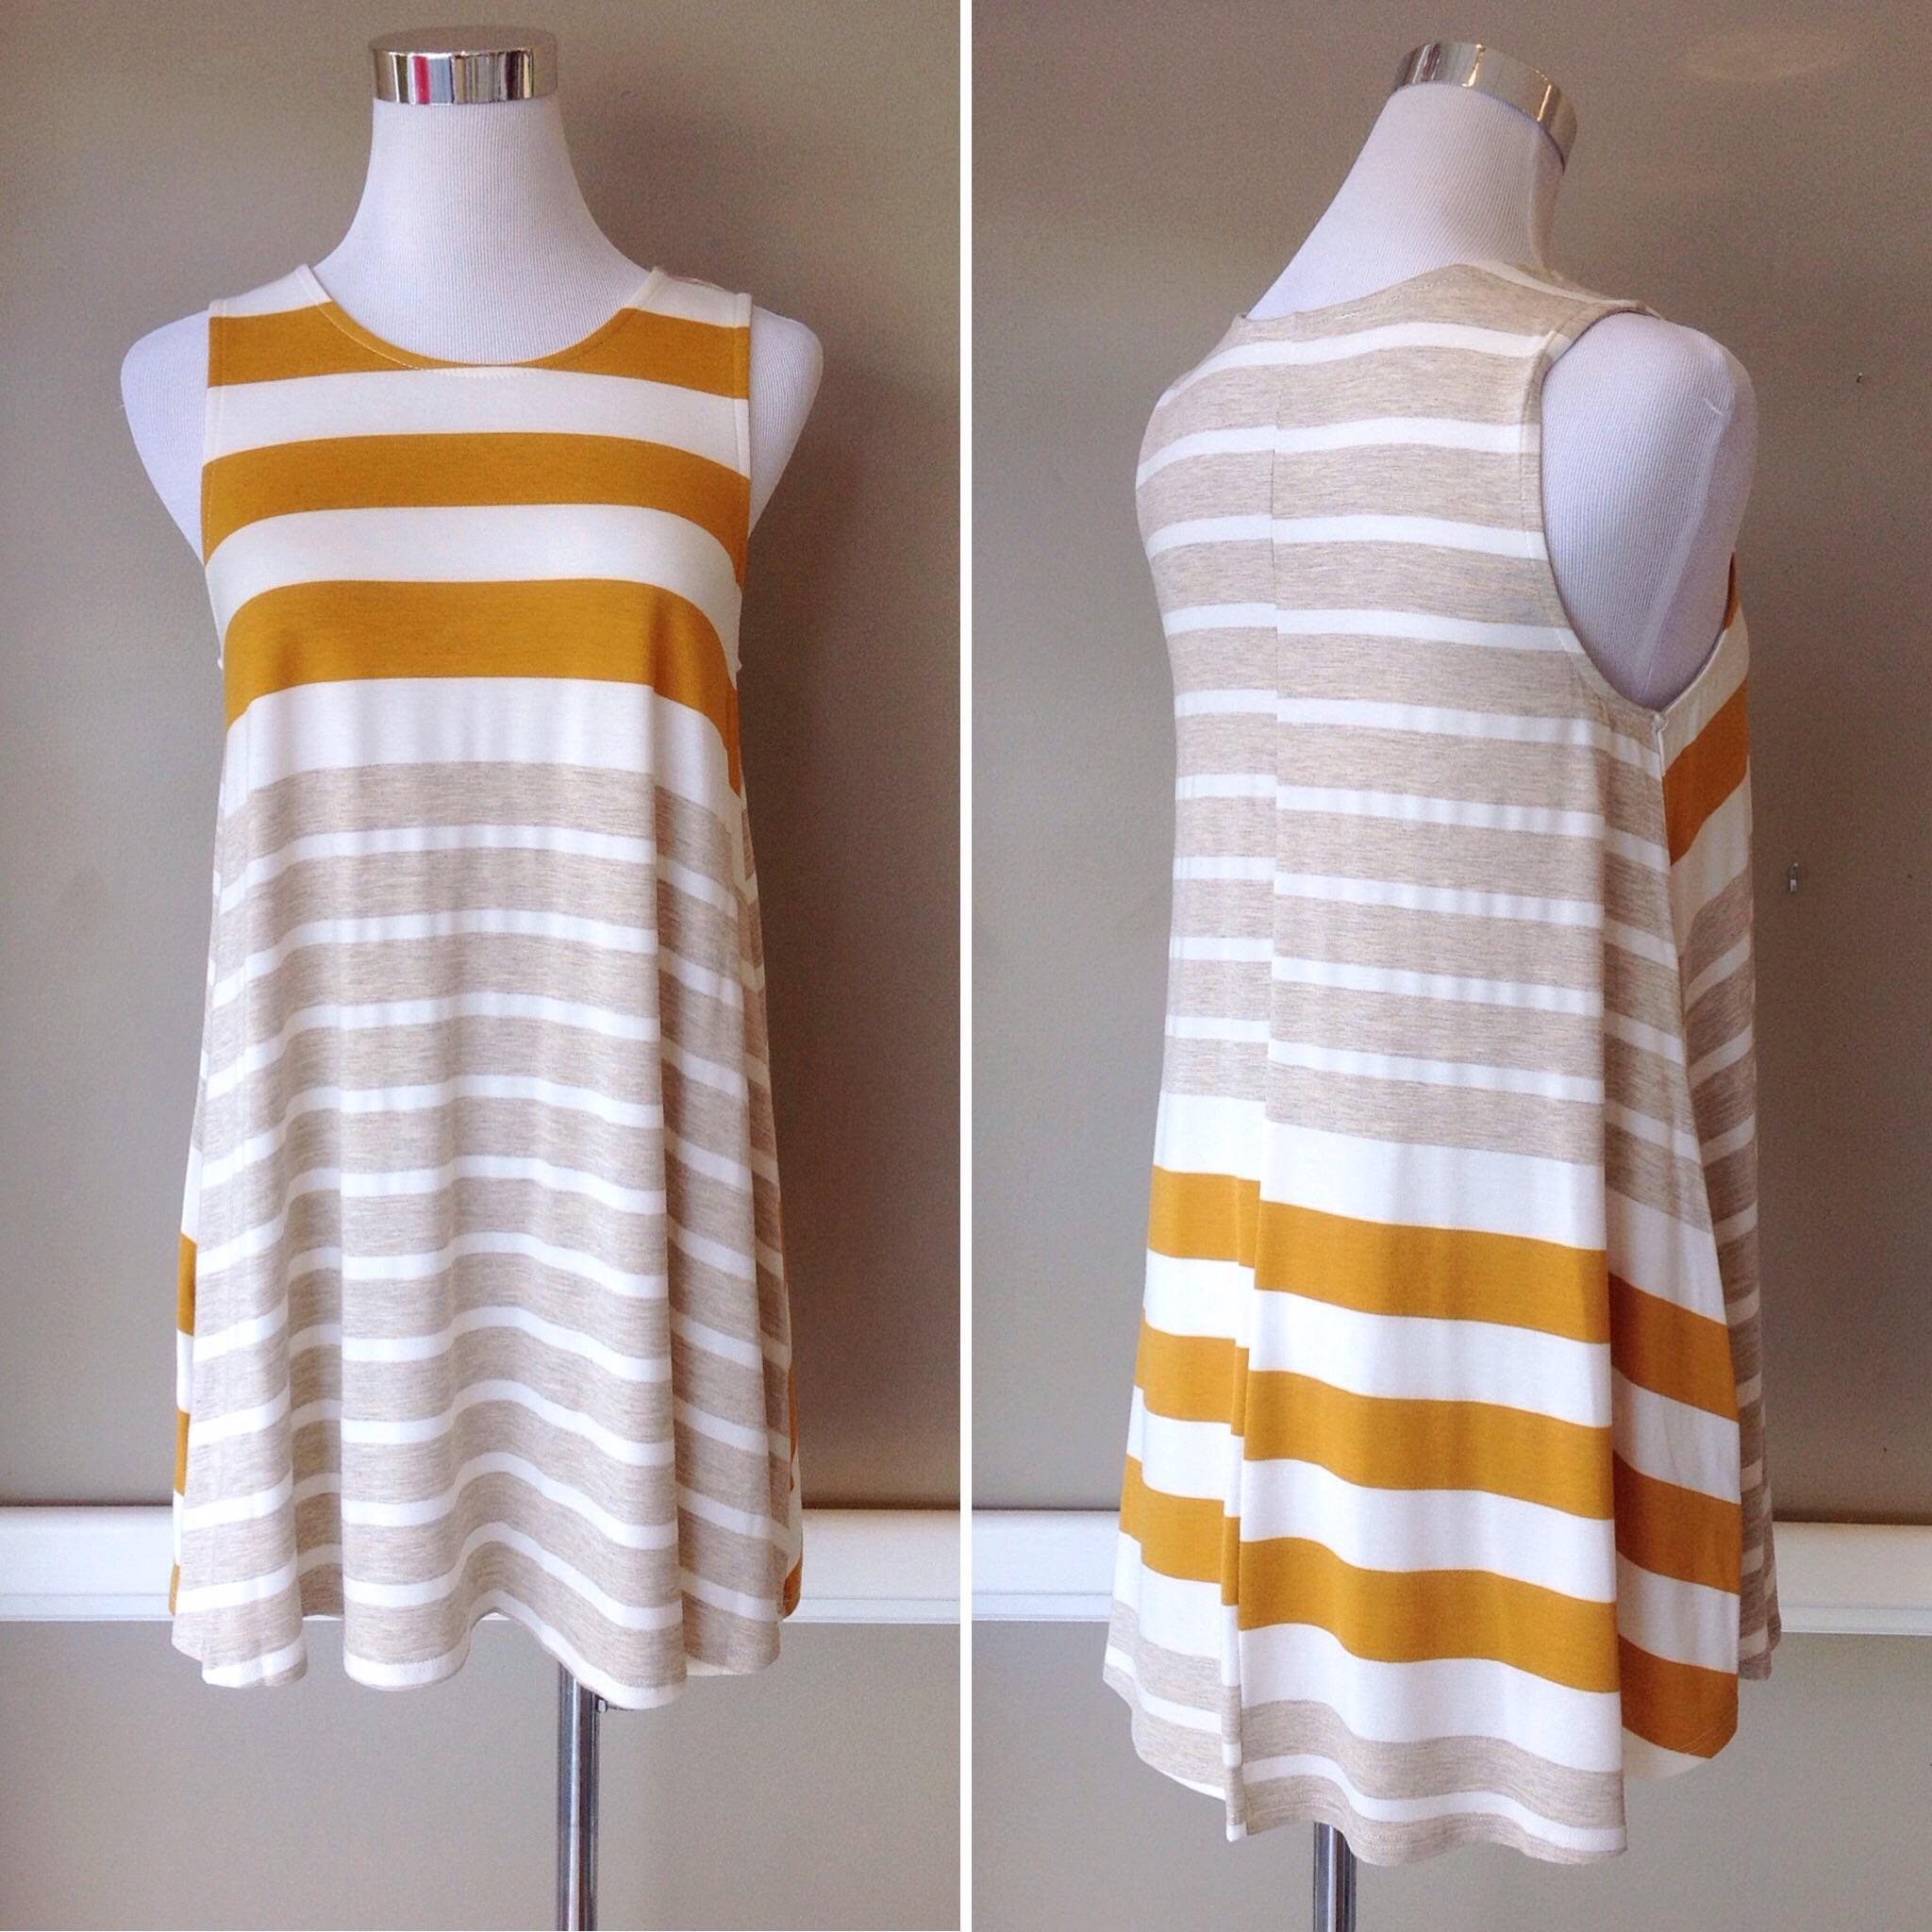 Stripe A-line tank dress with side pockets in mustard/oatmeal/ivory, $32